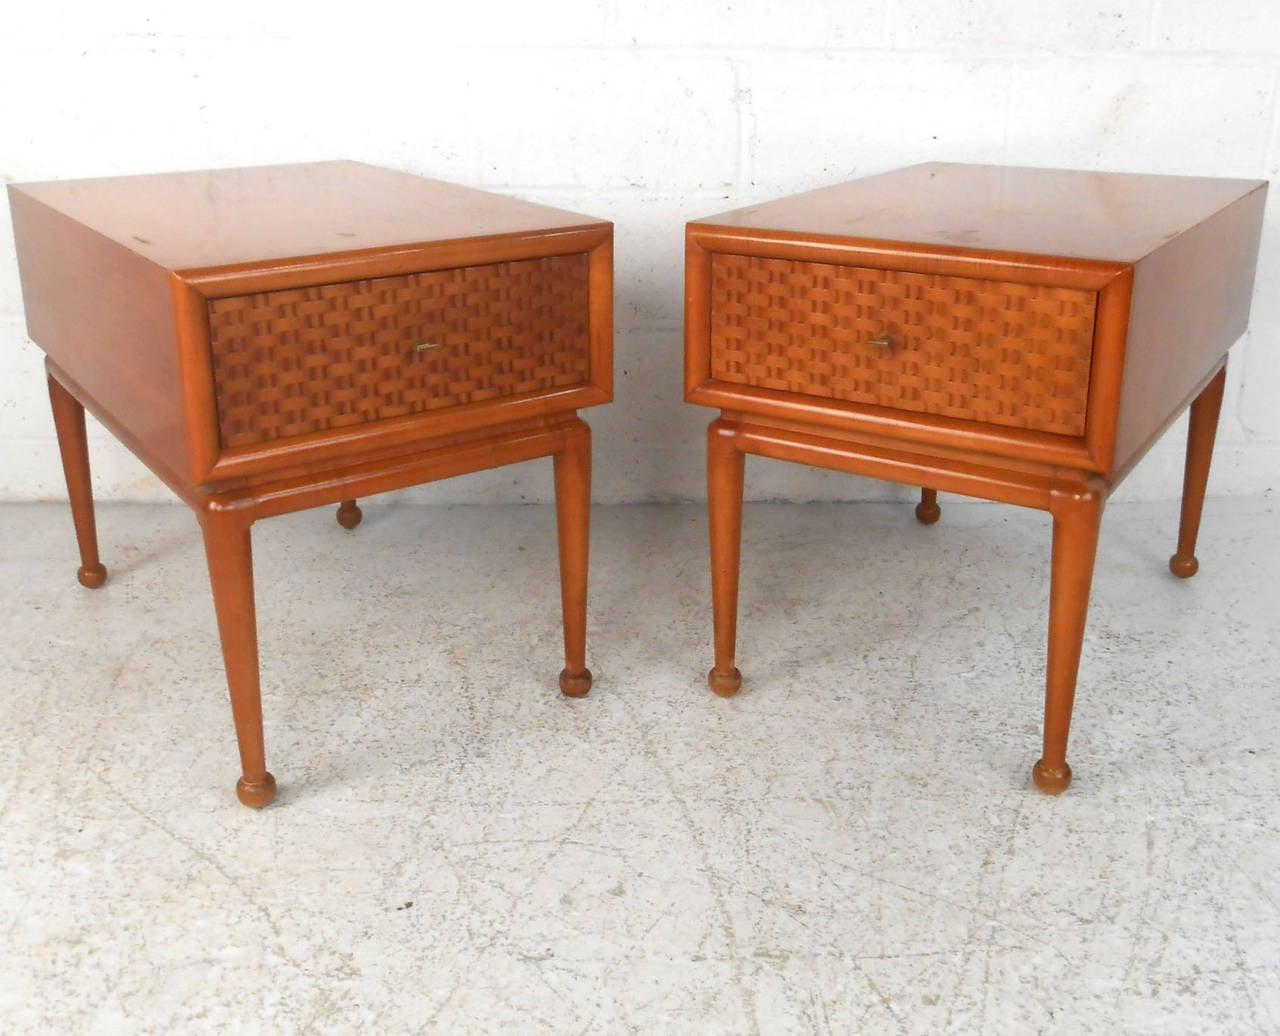 Pair Of Unique Midcentury Basket Weave End Tables For Sale